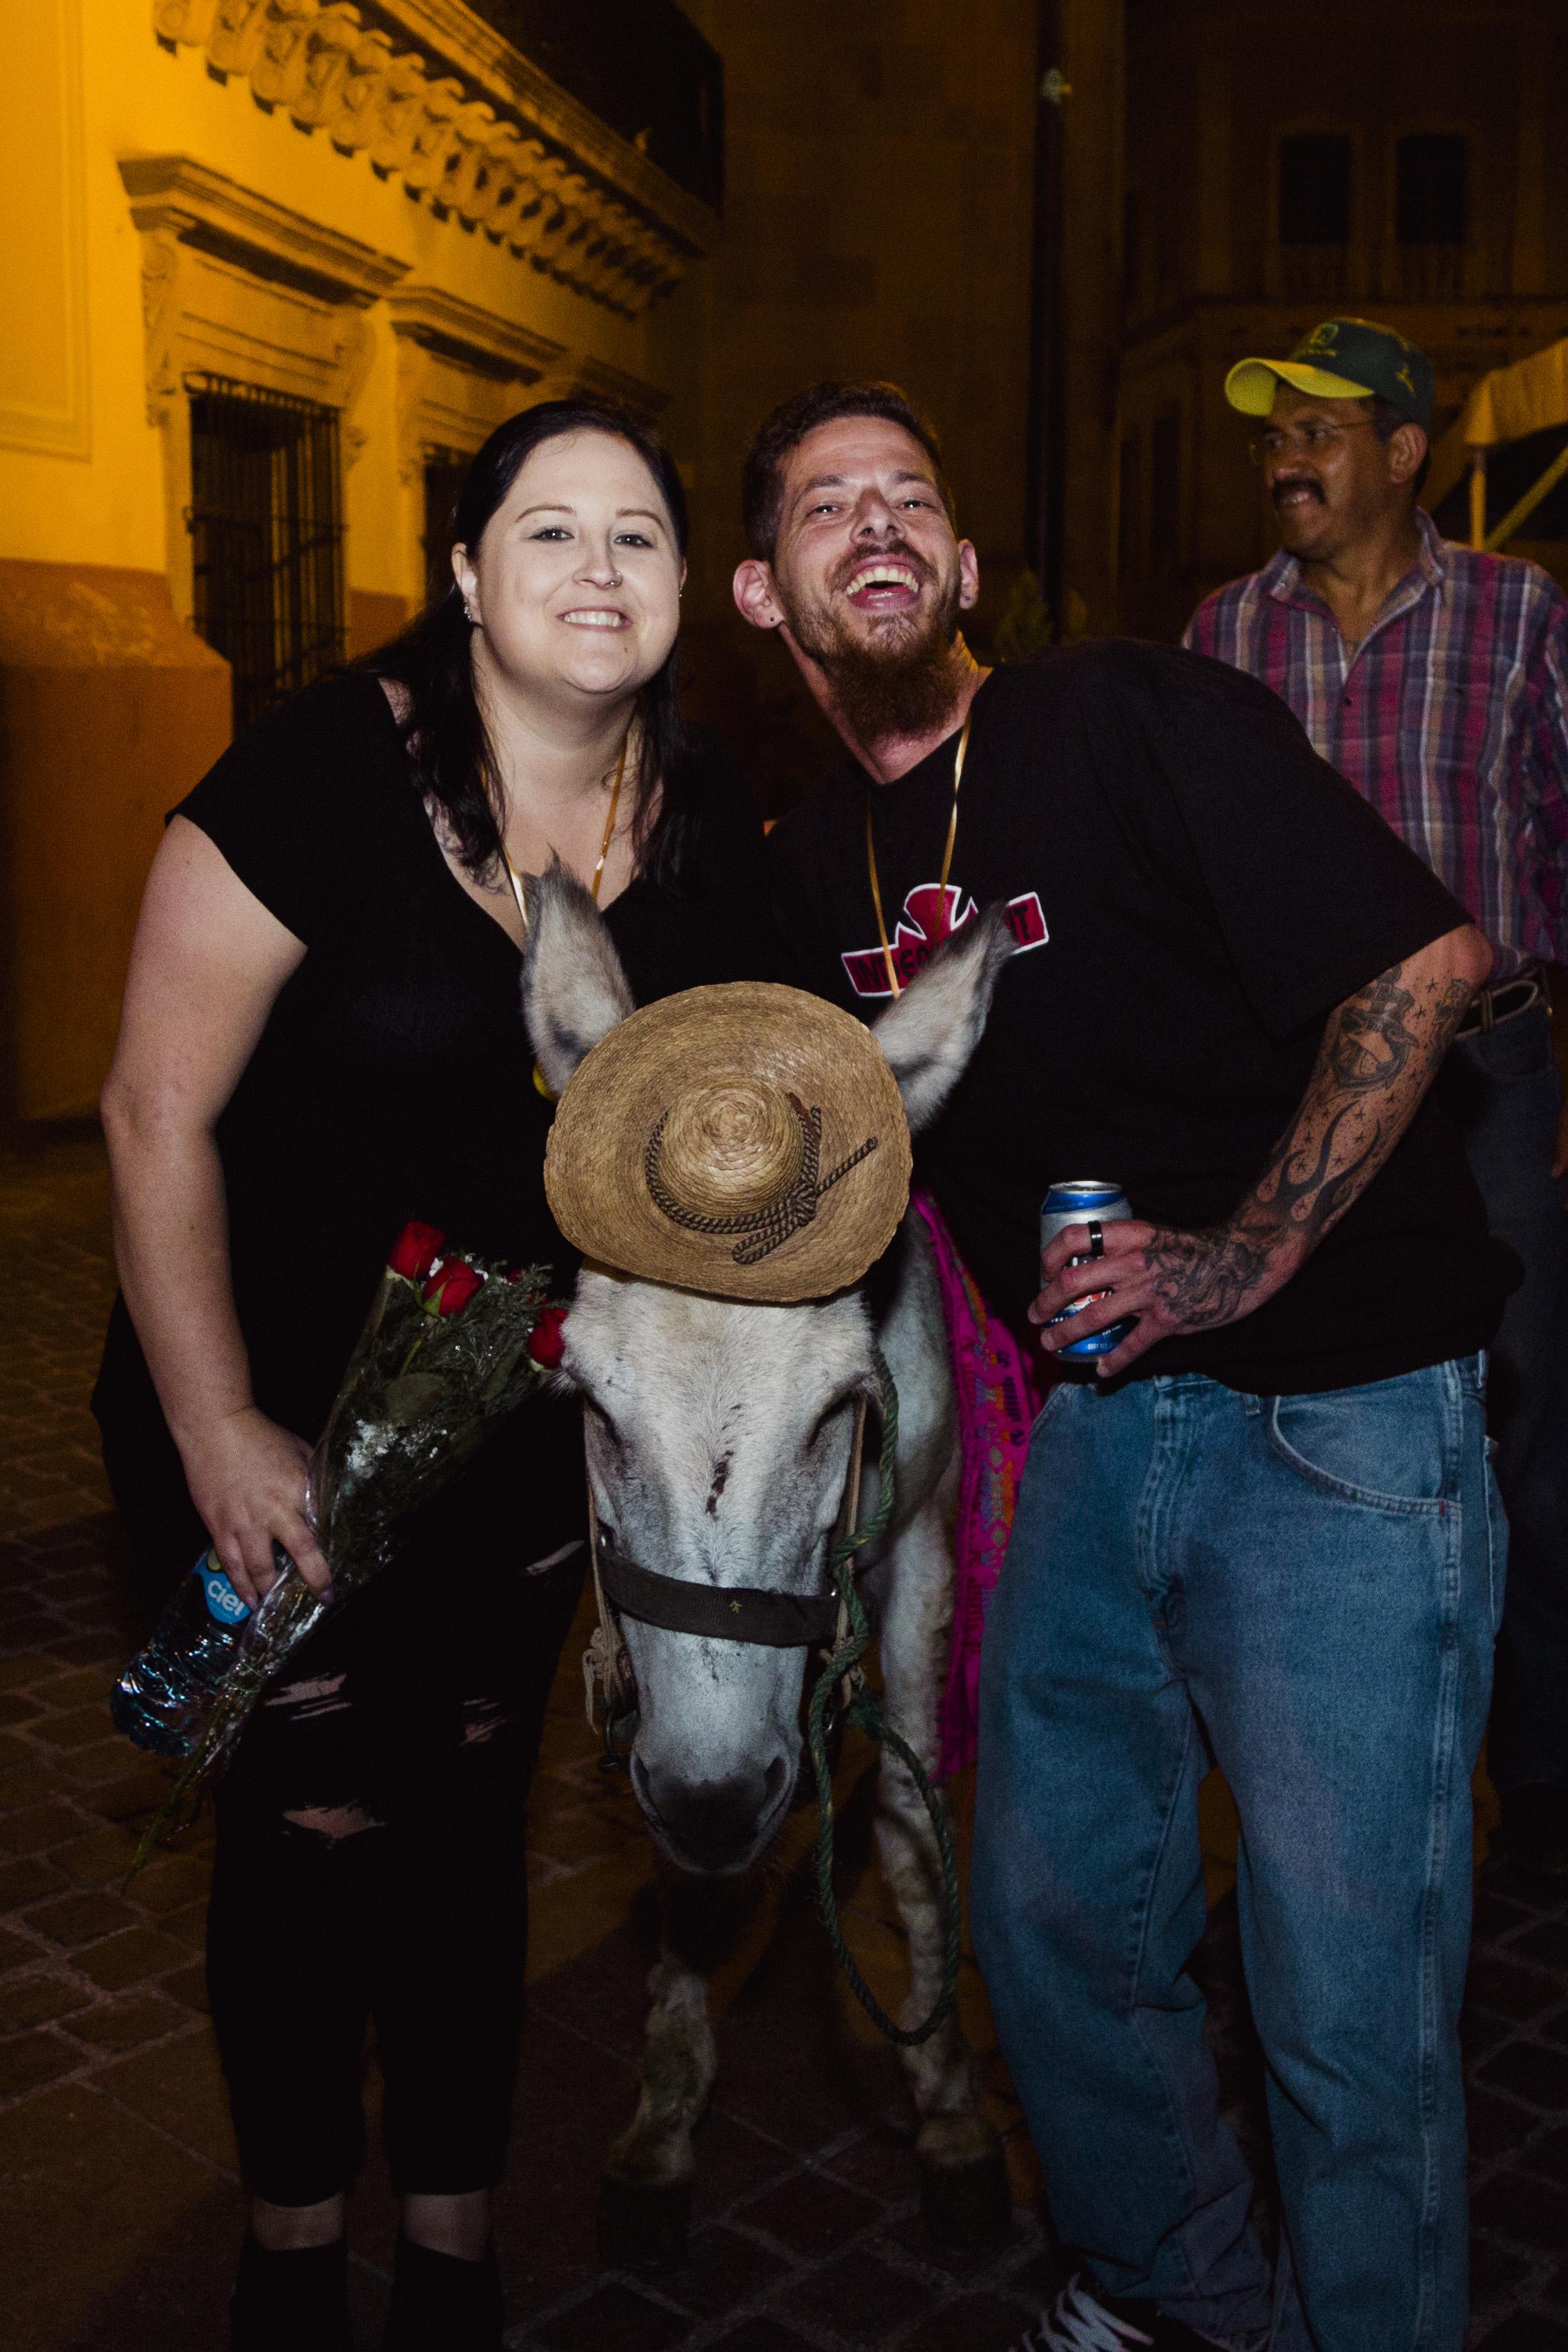 javier_noriega_fotografo_profesional_bodas_zacatecas_mexico_chihuahua_photographer13